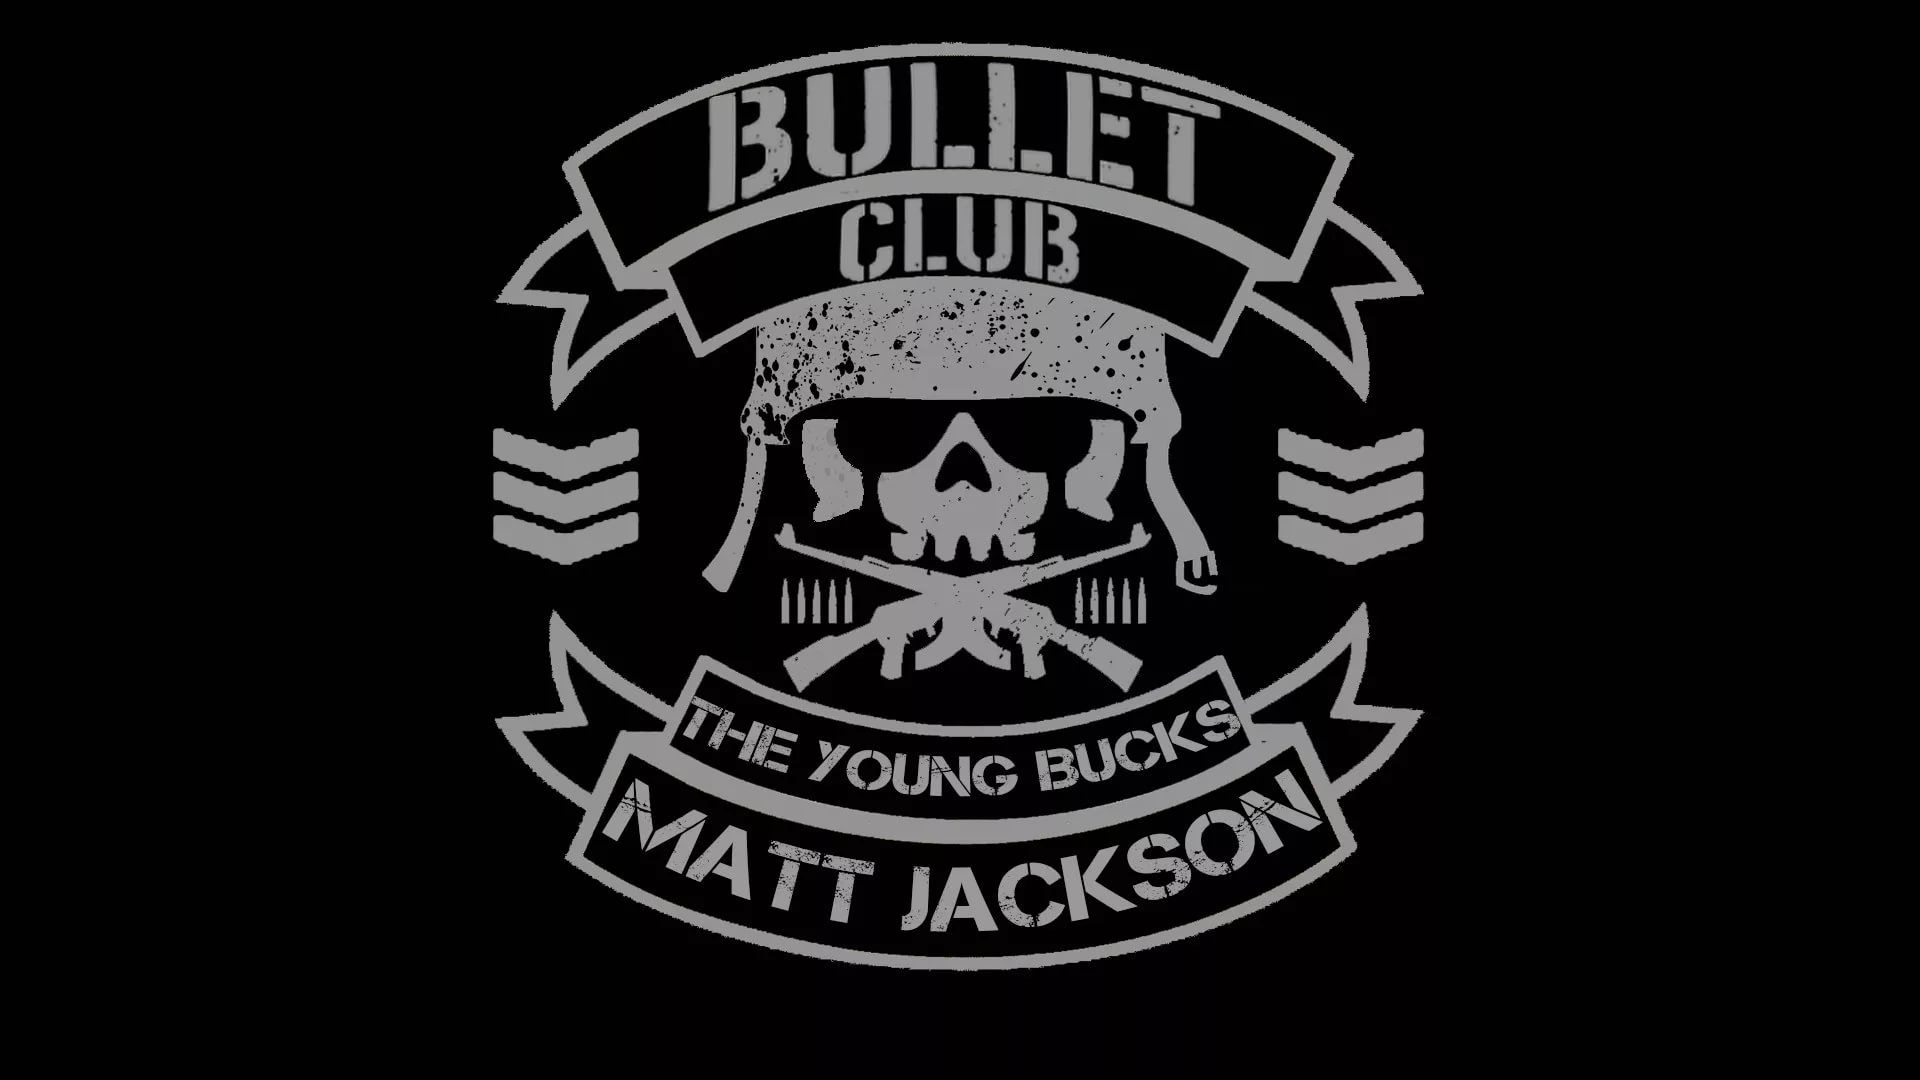 Bullet Club download wallpaper image